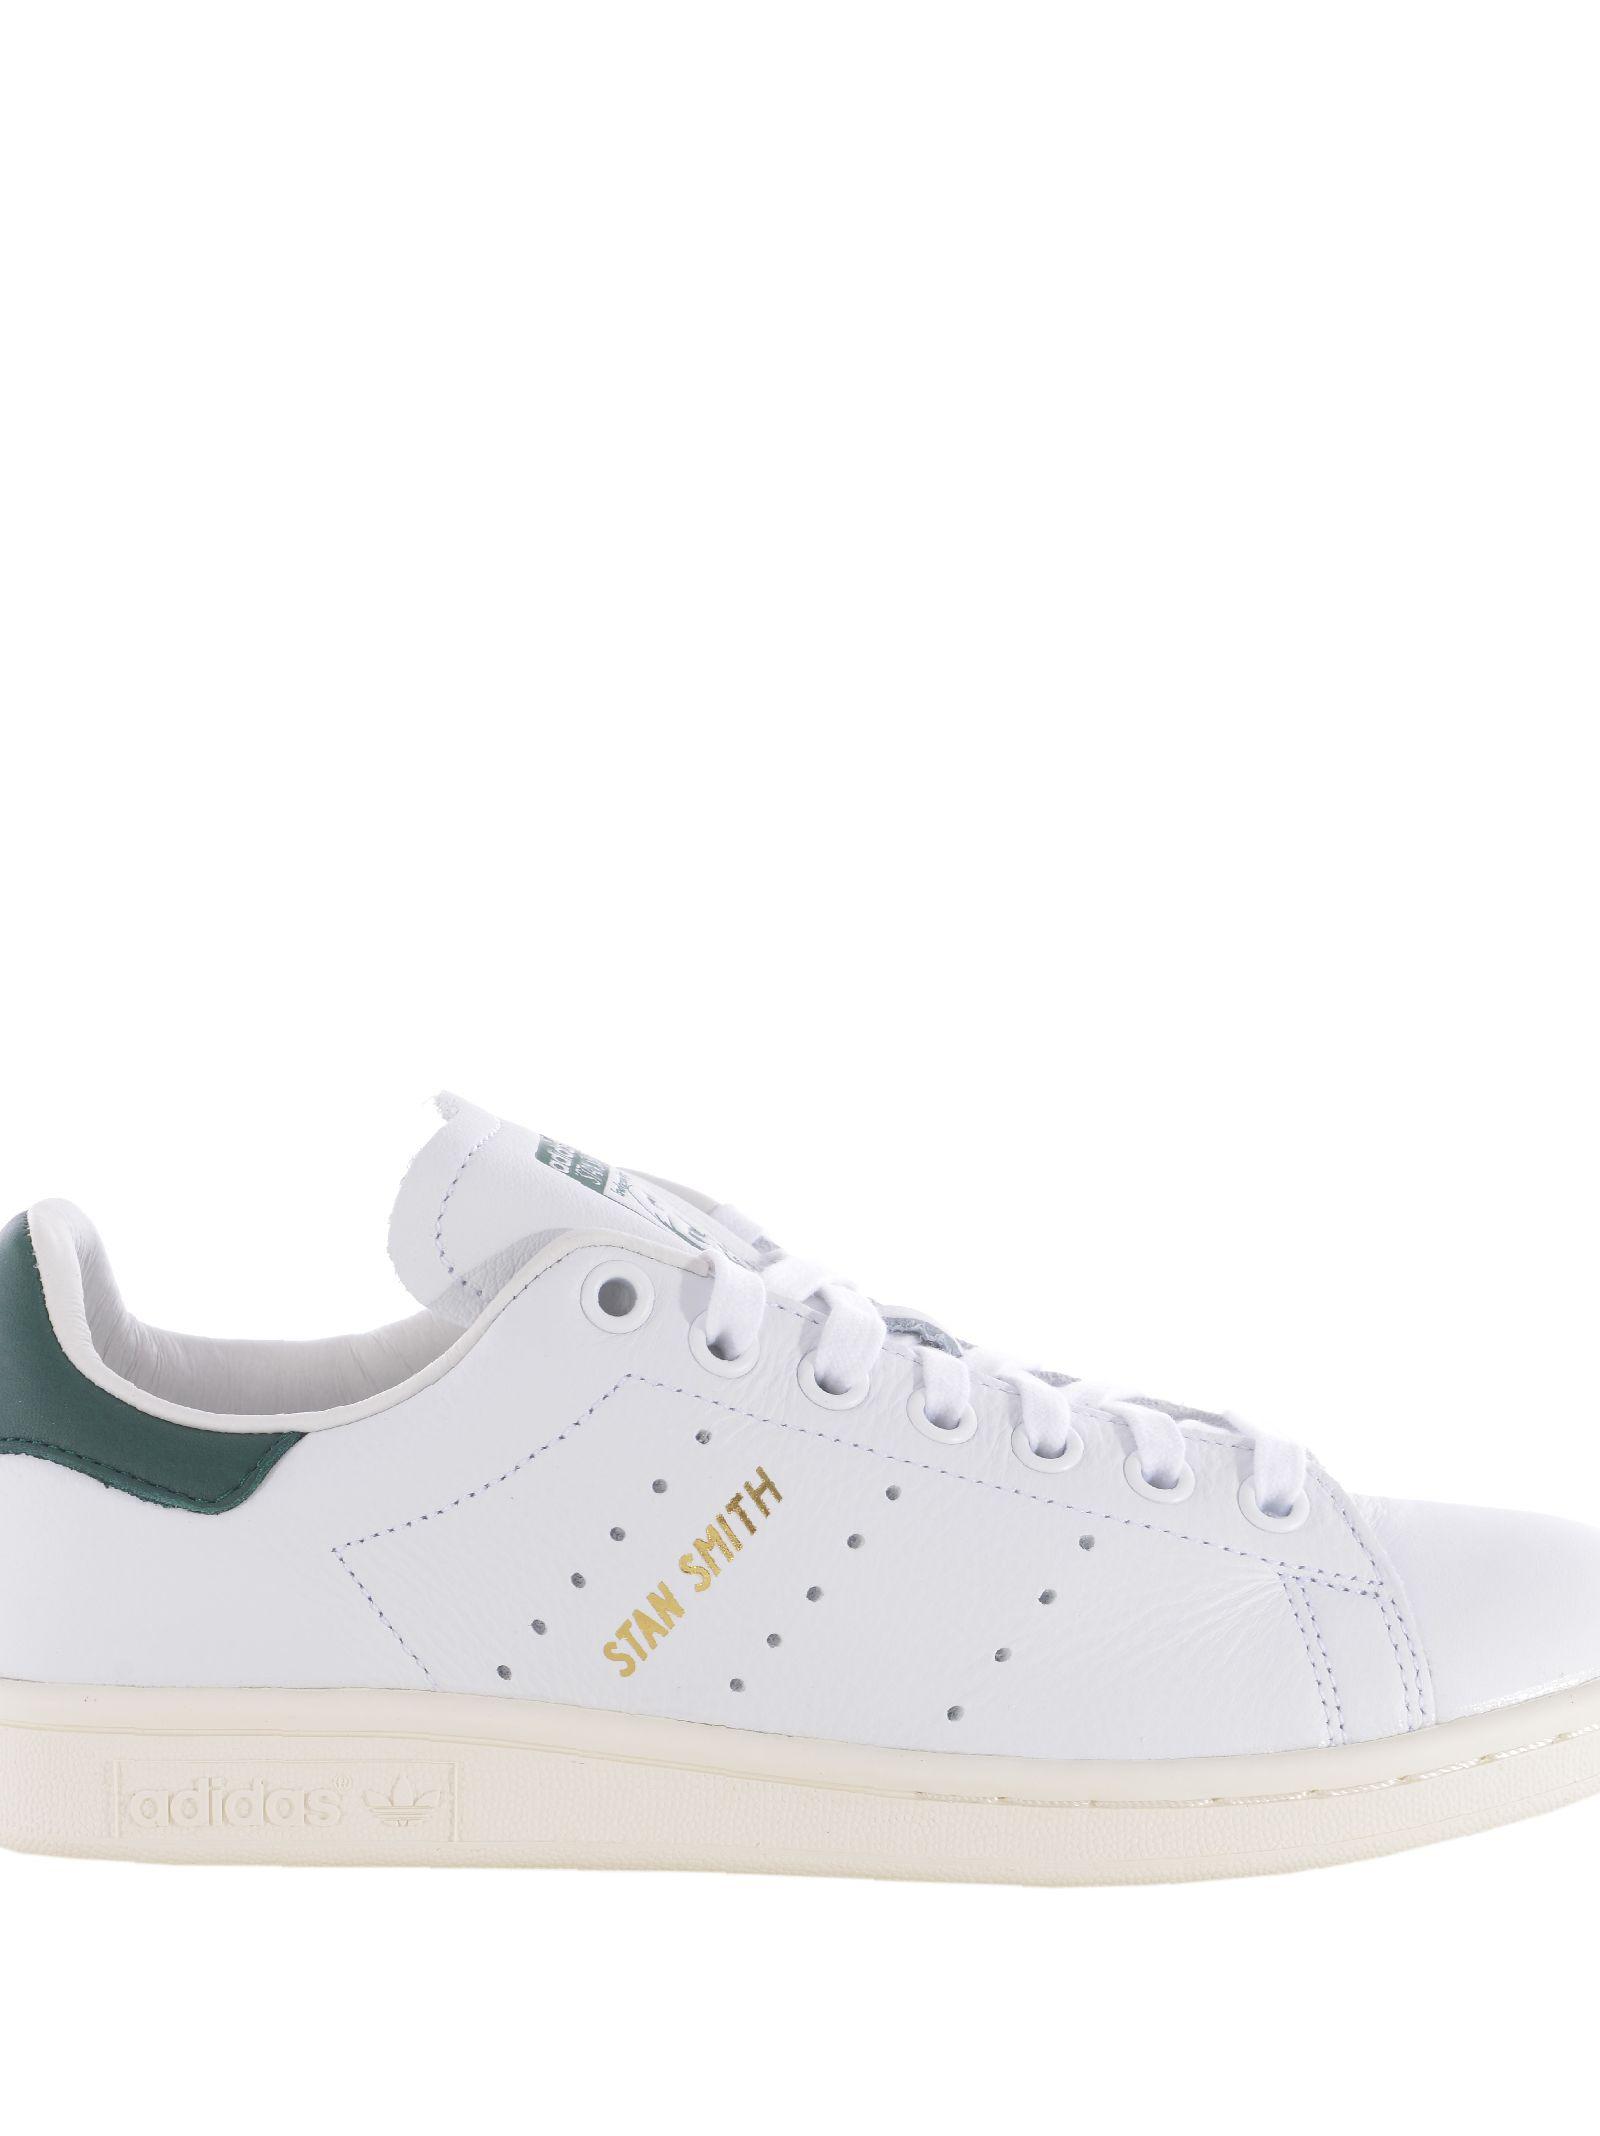 Adidas Originals Stan Smith Og Sneakers 10596804